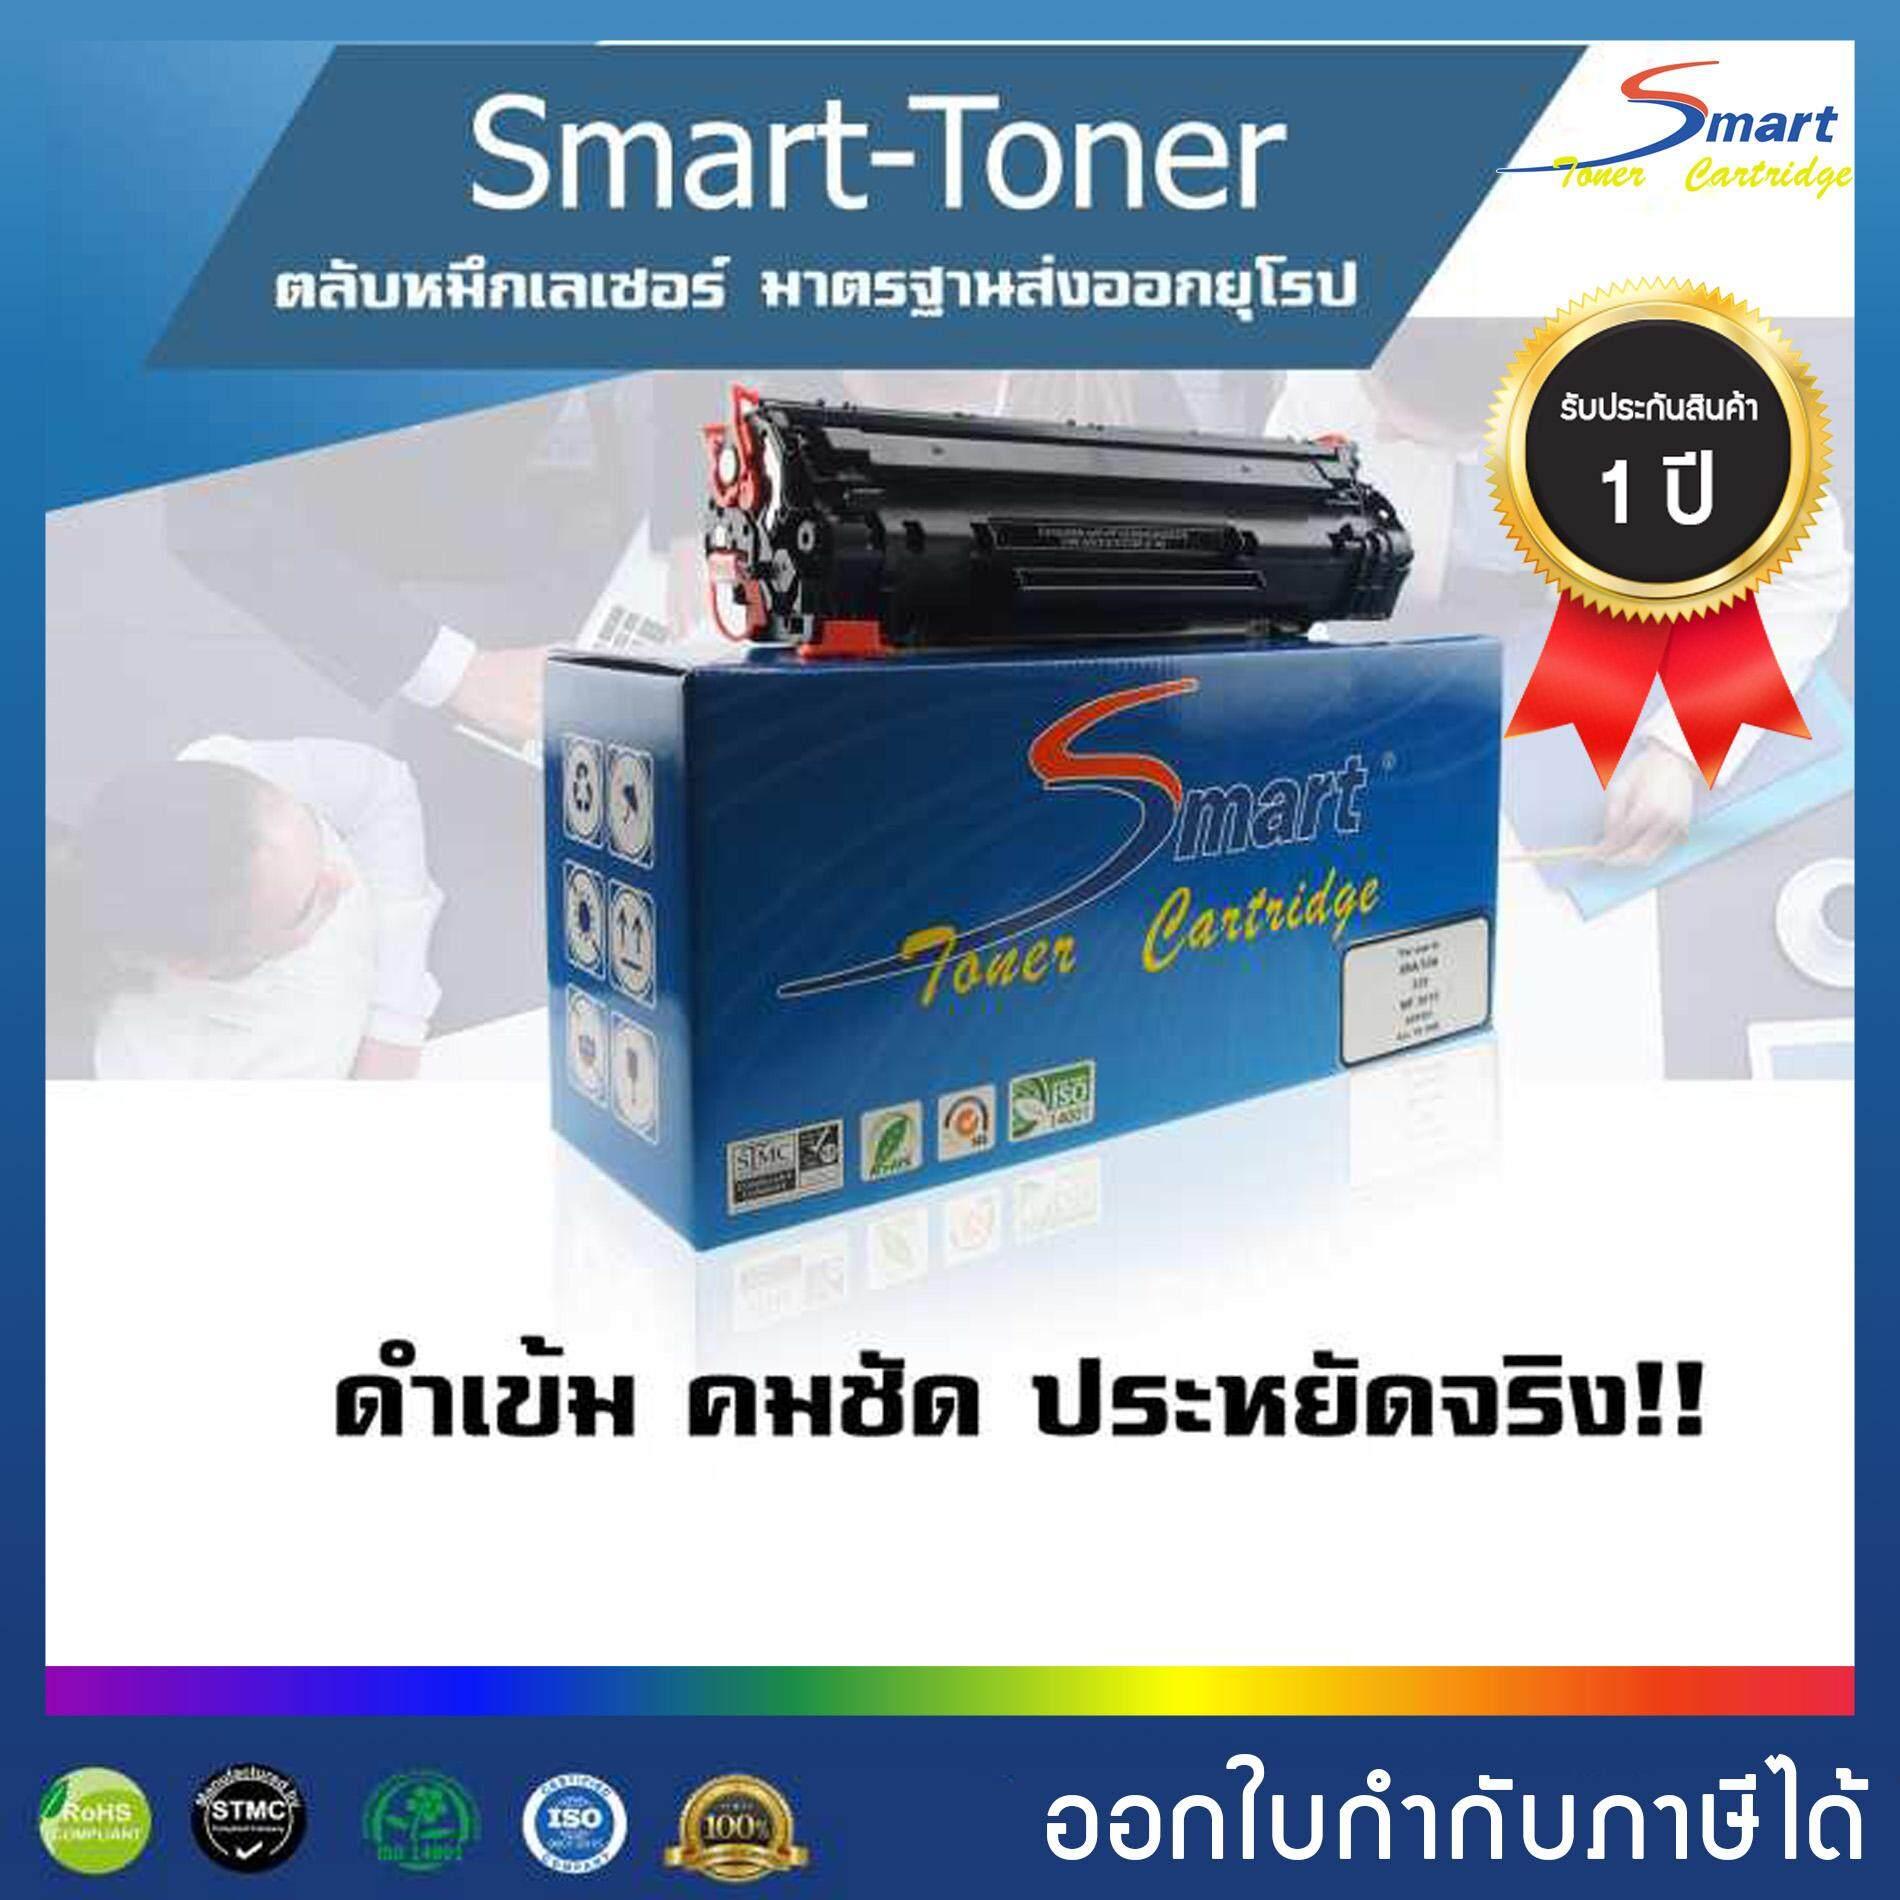 Smart Toner ตลับหมึก 35A/36A/85A/88A สำหรับปริ้นเตอร์ HP P1005/1006/ P1007/P1008/P1102/P1102W/P1106/P1505/P1505n/P1560/P1566/P1606/P1600/M1120/M1120n/M1132/M1212nf/M1217/M1320/M1522/M1522n และ CANON LBP3050/MF3010 ตลับหมึกพิมพ์เลเซอร์ หมึกราคา